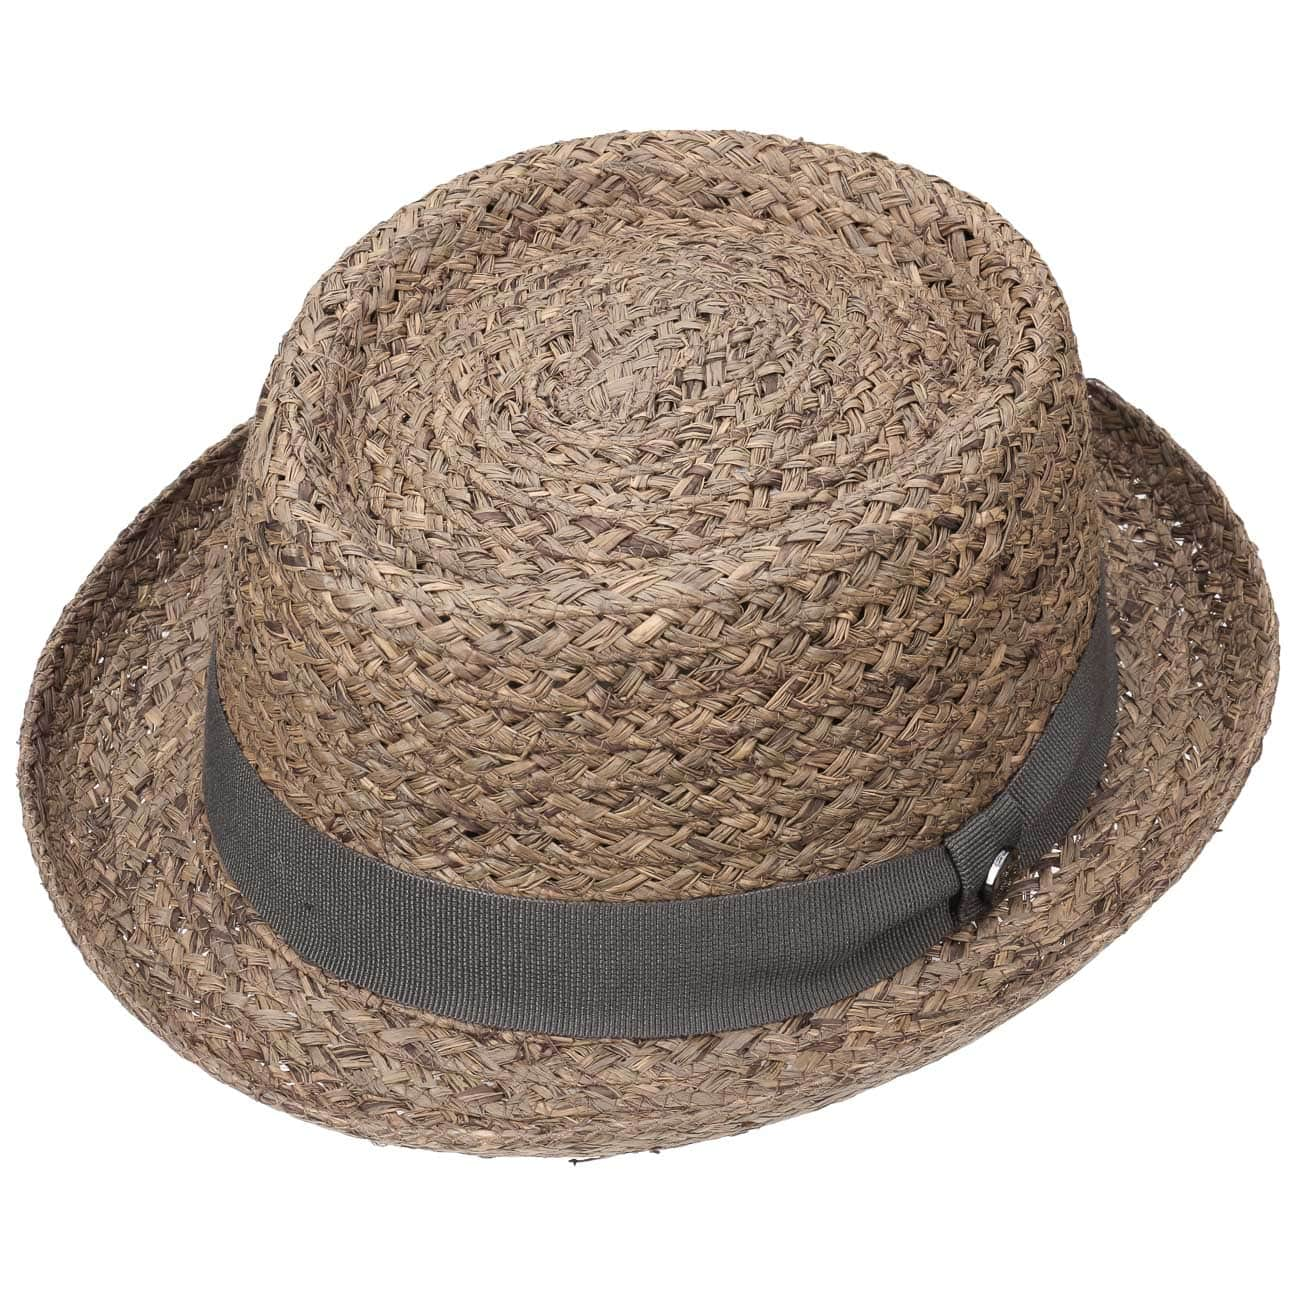 Raffia Straw XXL Brim Floppy Hat by Lierys Sun hats Lierys Get To Buy Online bRNVpSt